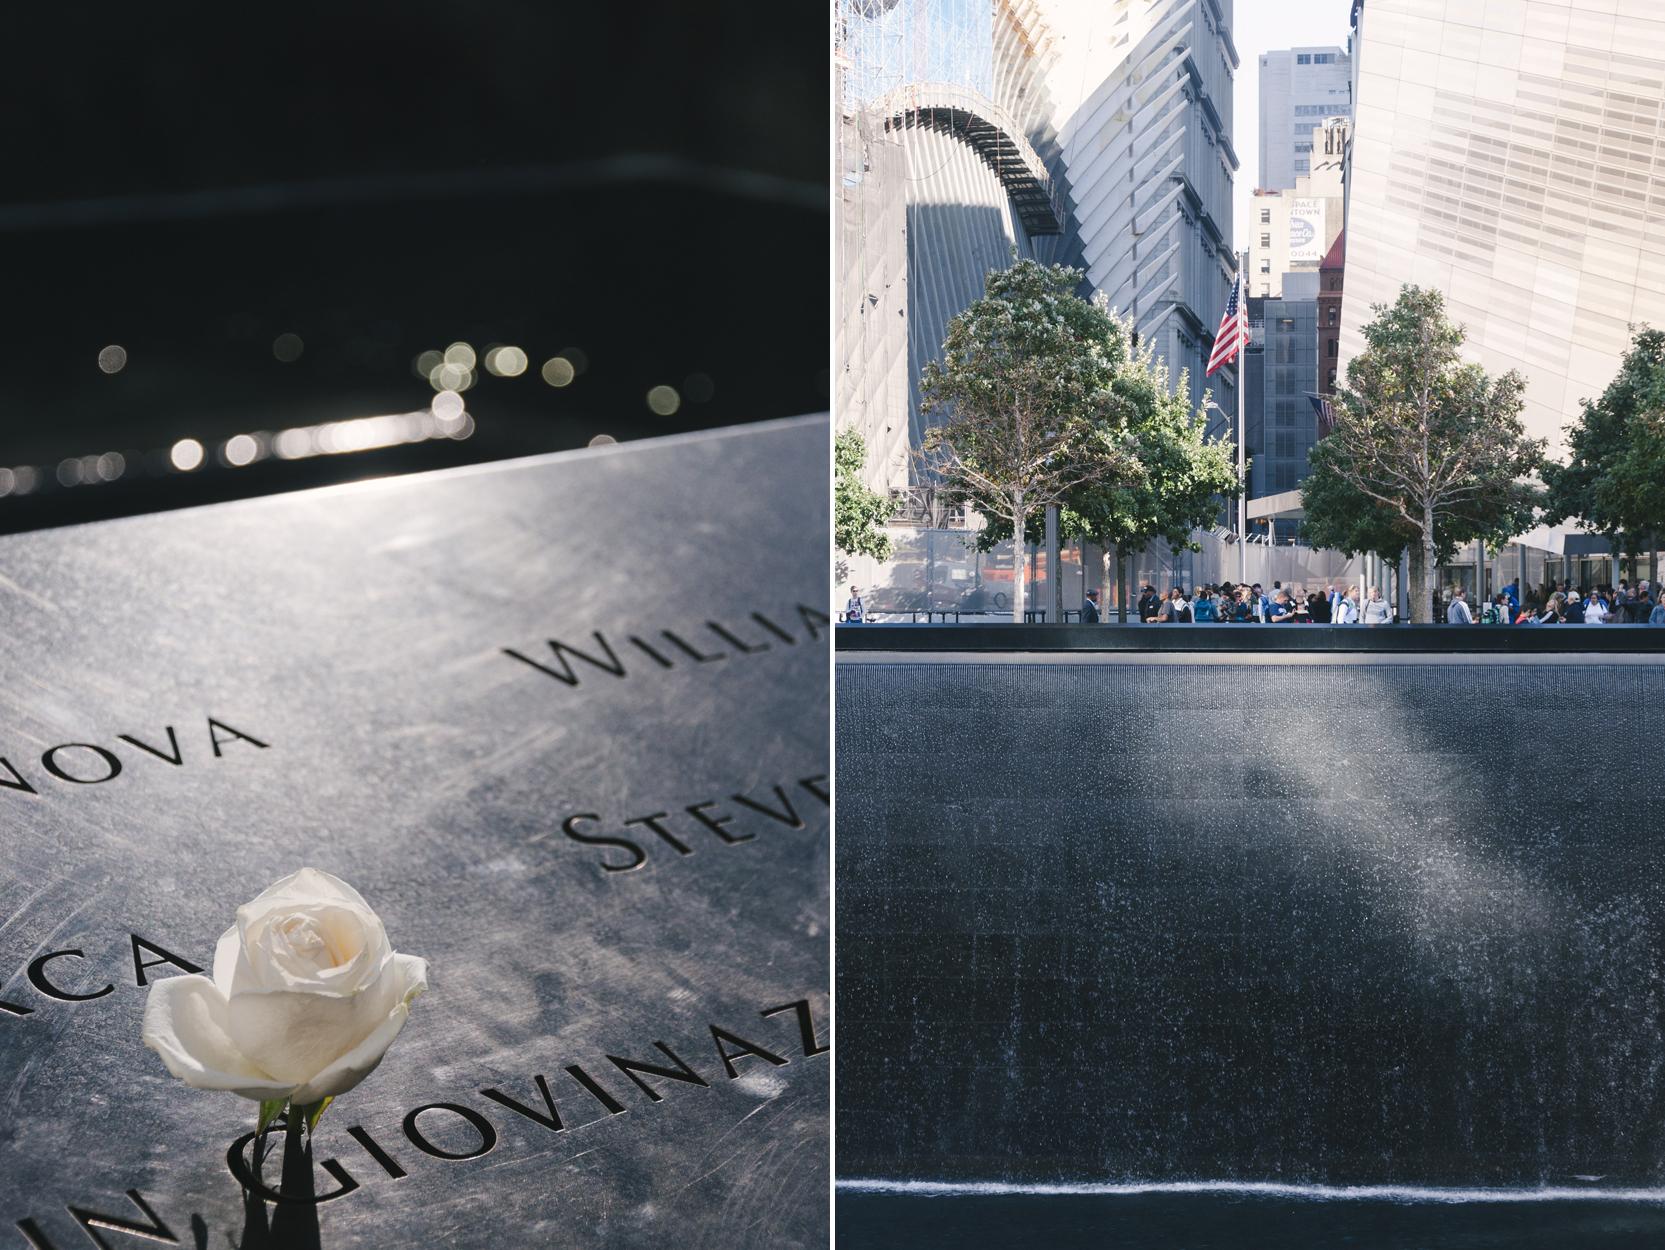 New-York-110.jpg